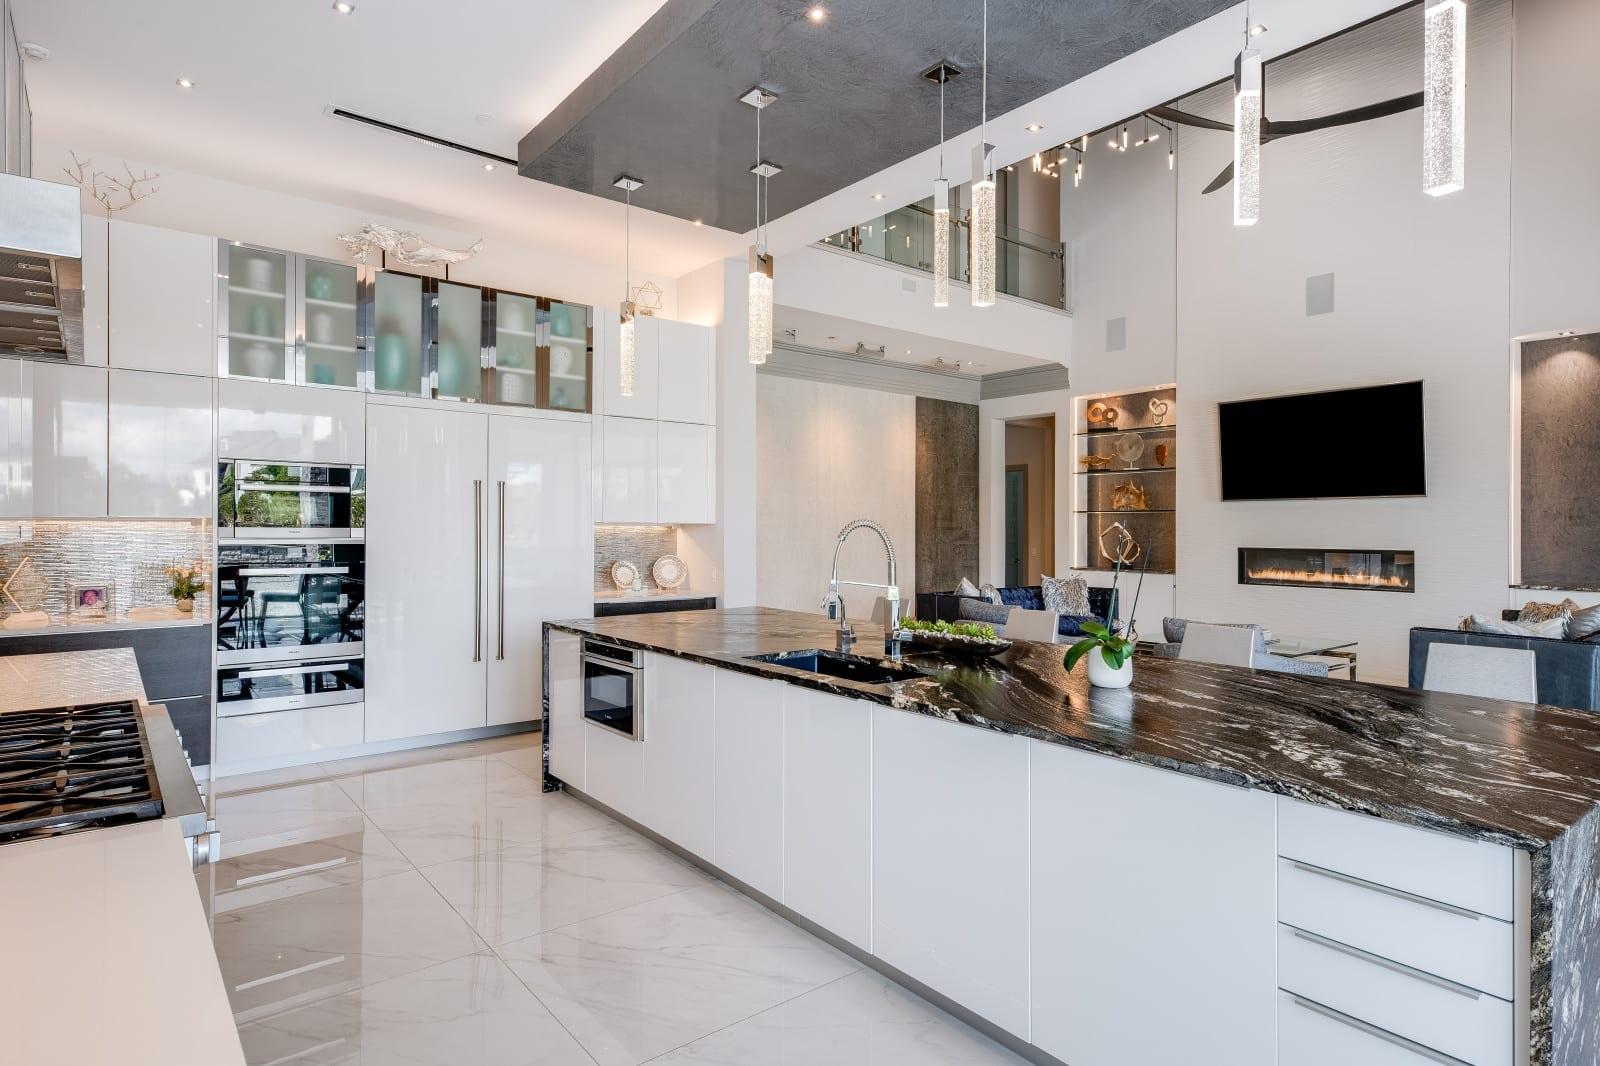 Custom Home Build and Interior Design # 31 - Millennial Design + Build, Home Builders in Dallas Texas, modern style homes, and custom home builders in DFW